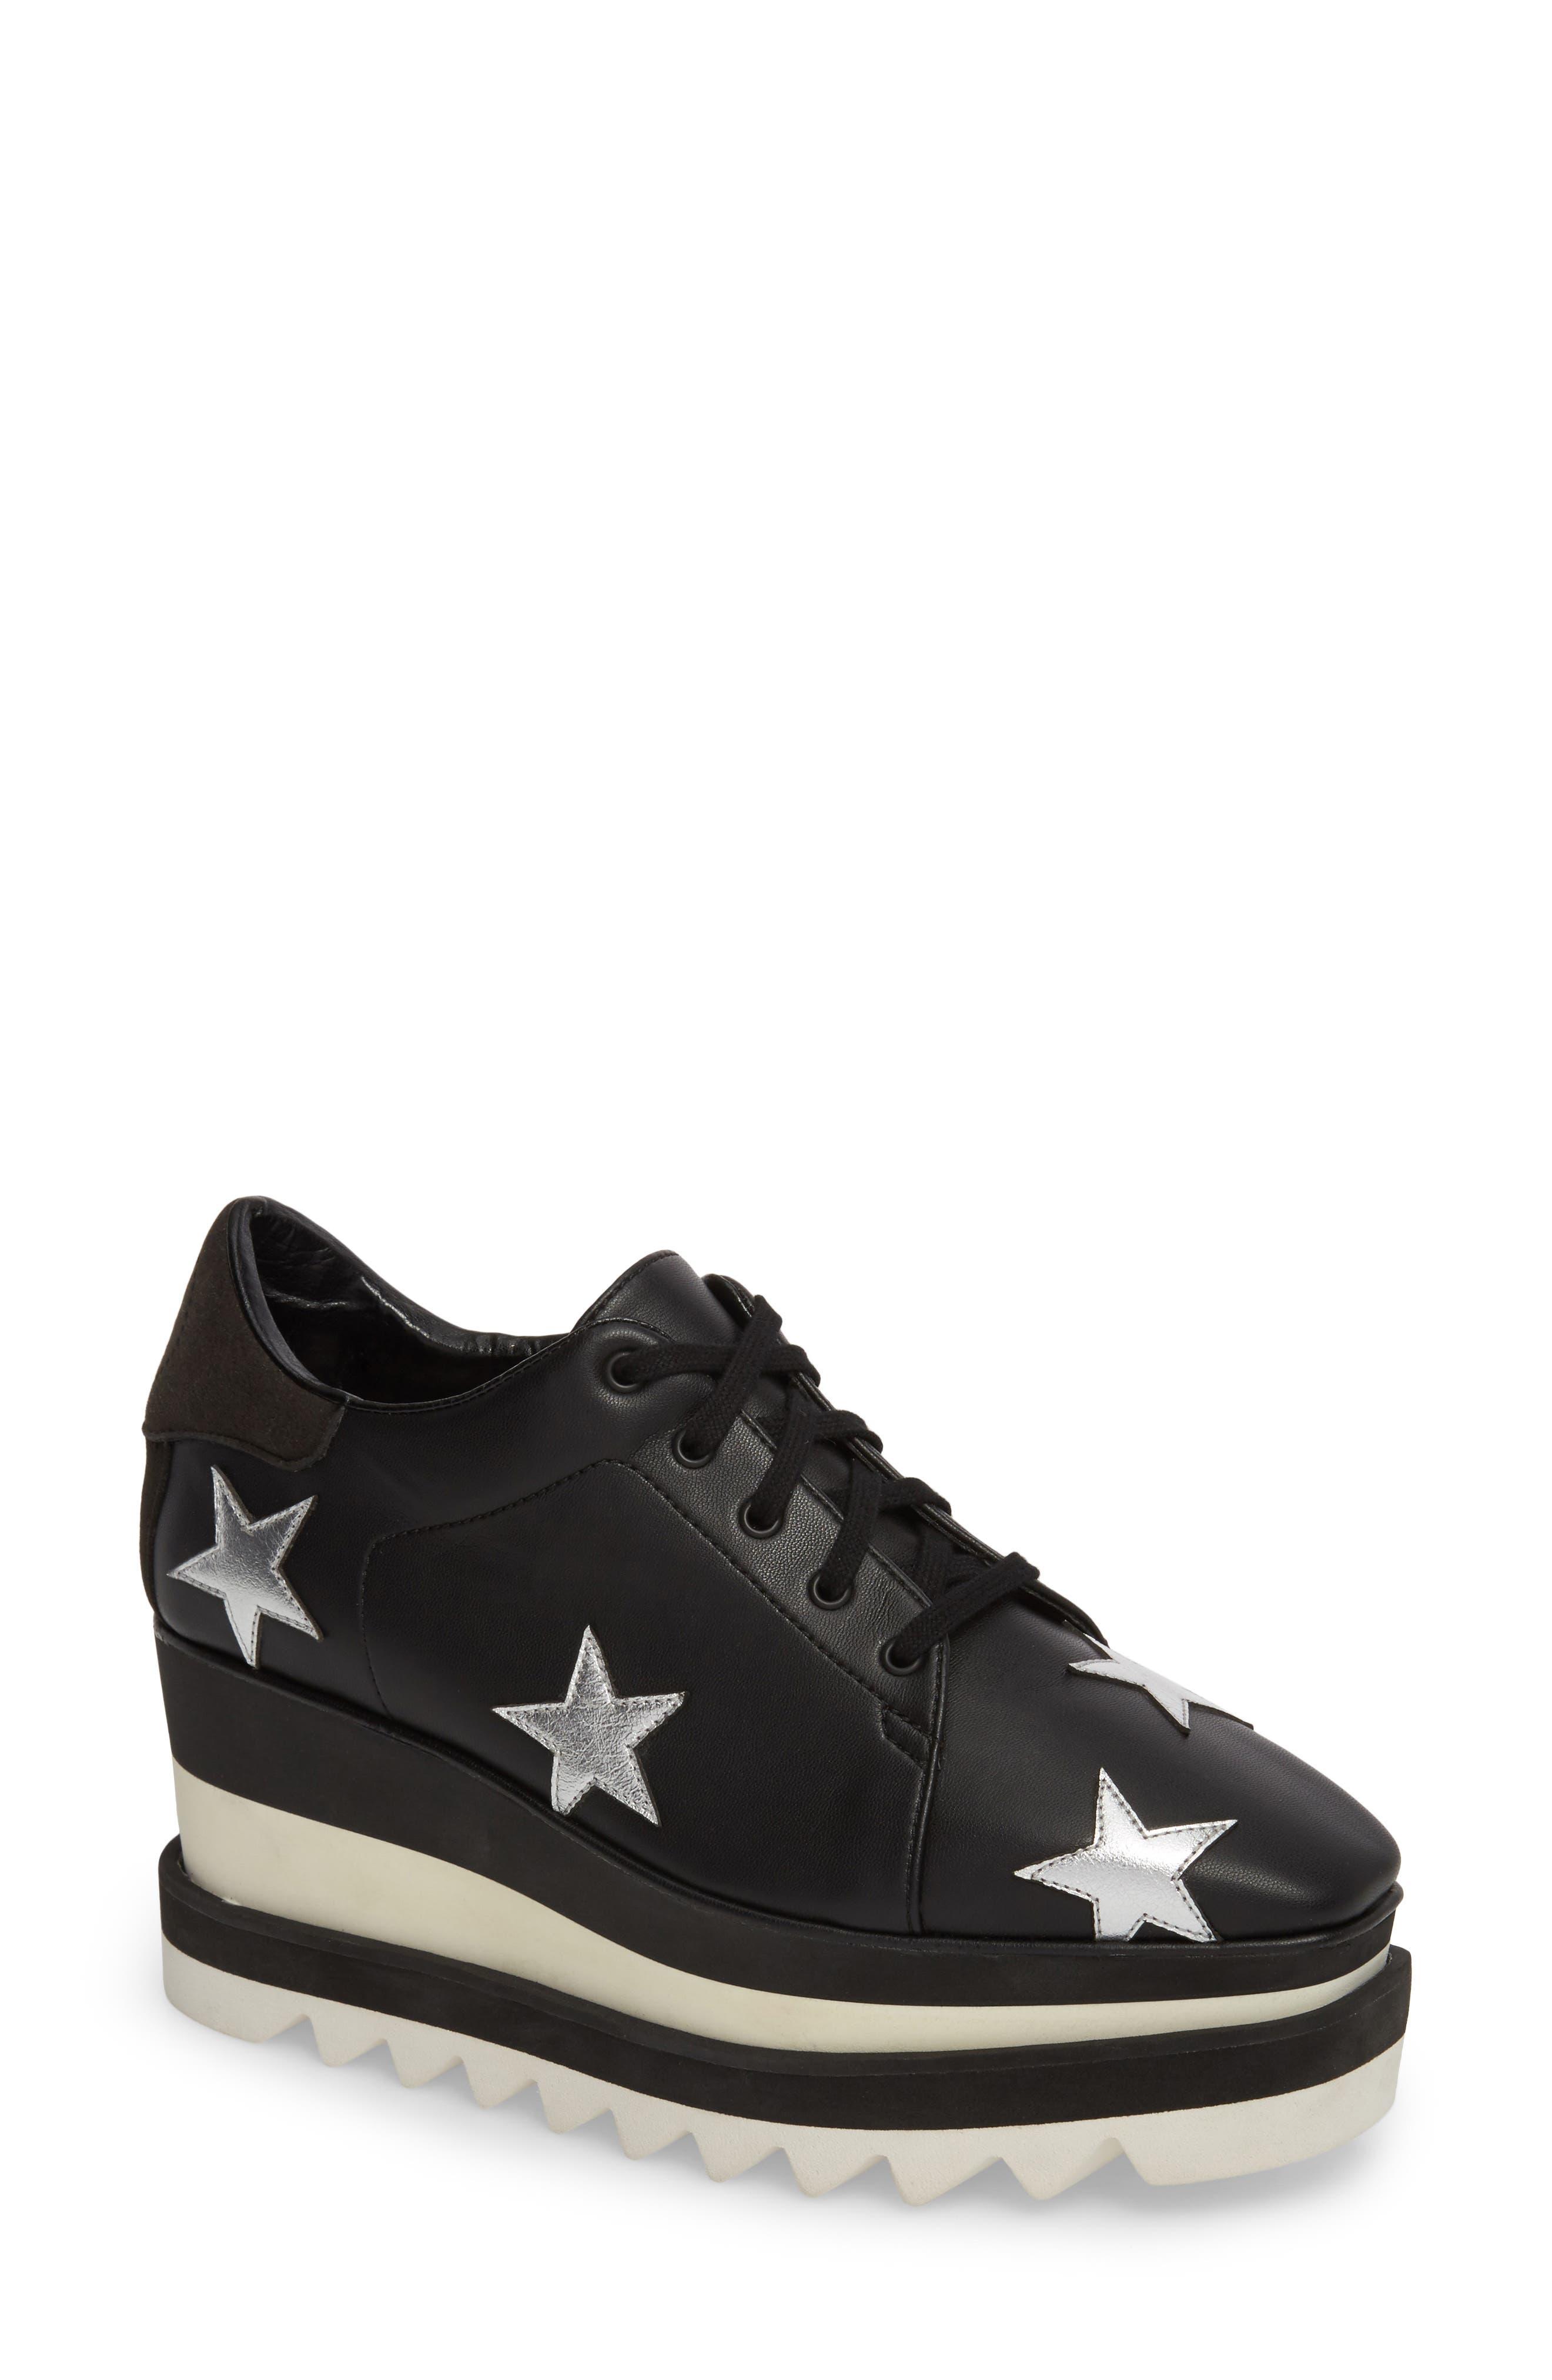 Stella Mccartney Elyse Platform Sneaker, Black